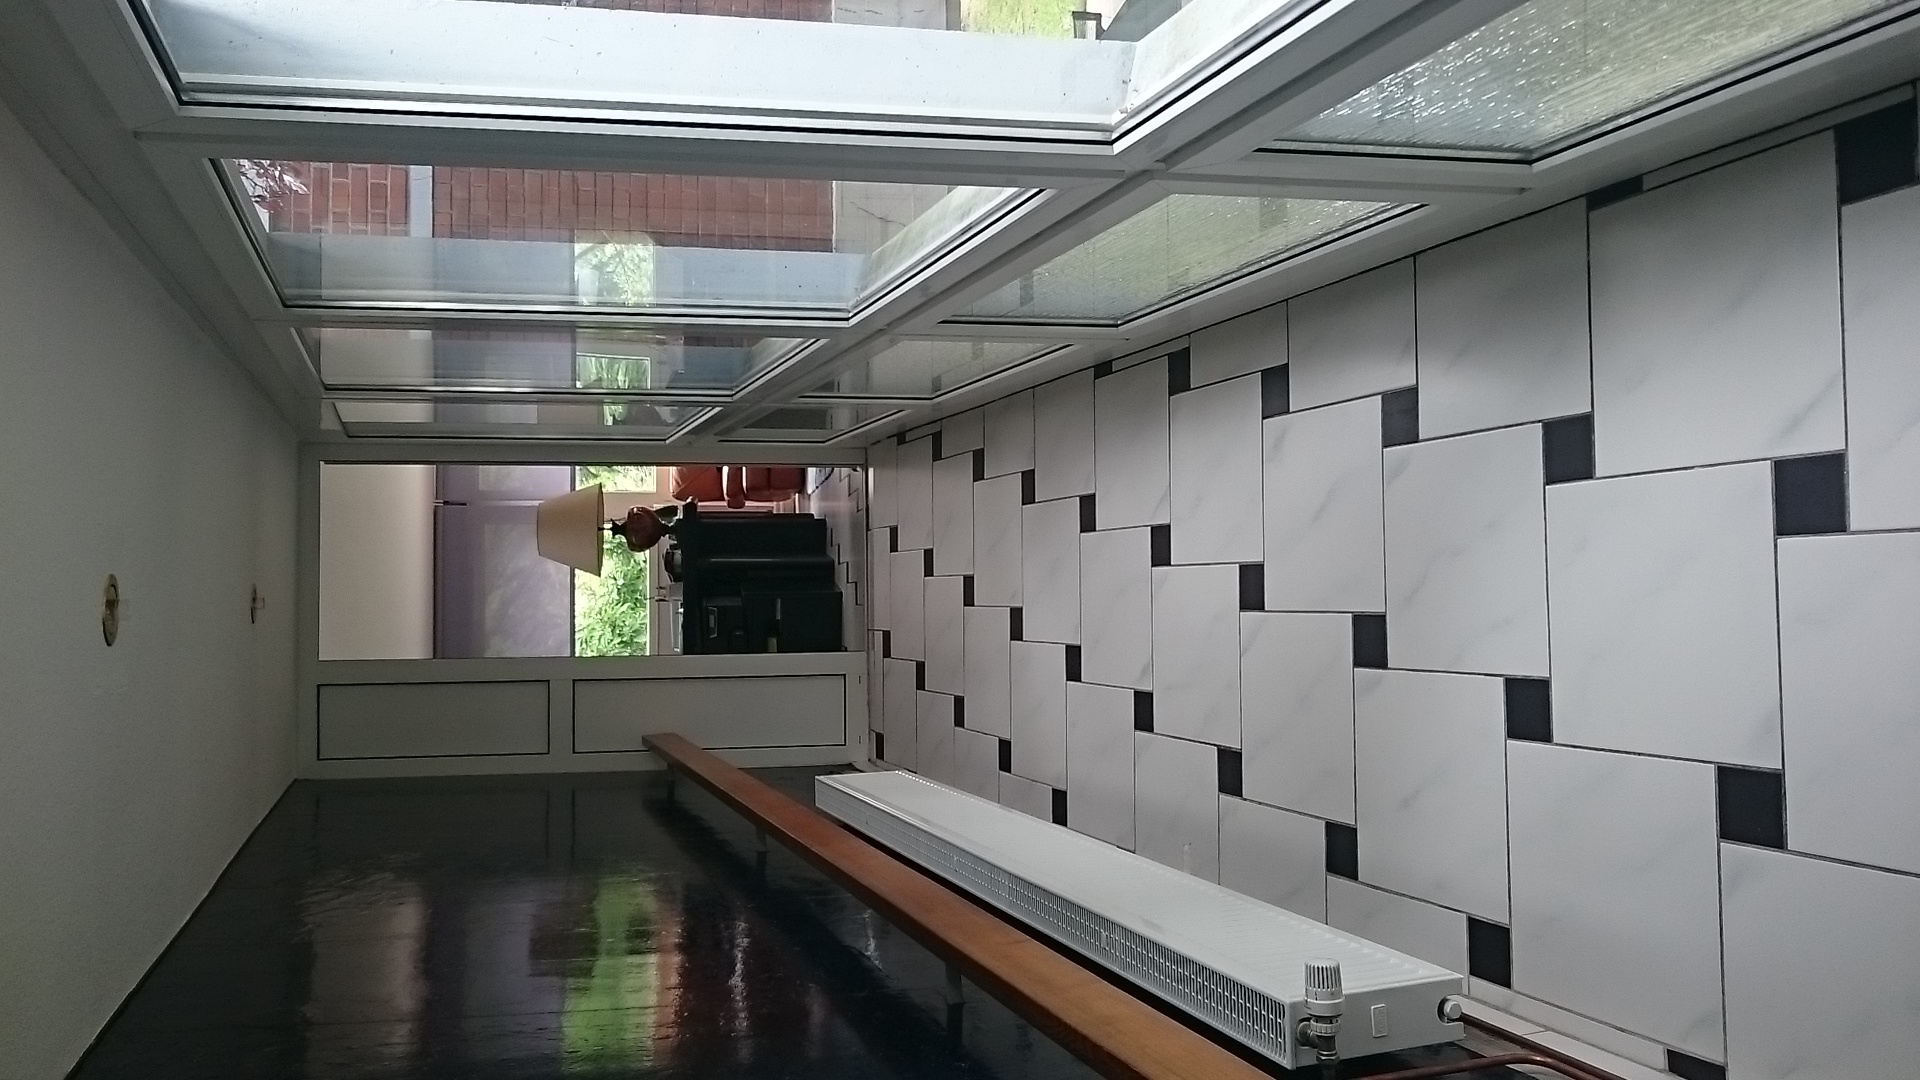 acheter maison 7 pi ces haguenau 203 m 419 000 immobili re strauss. Black Bedroom Furniture Sets. Home Design Ideas